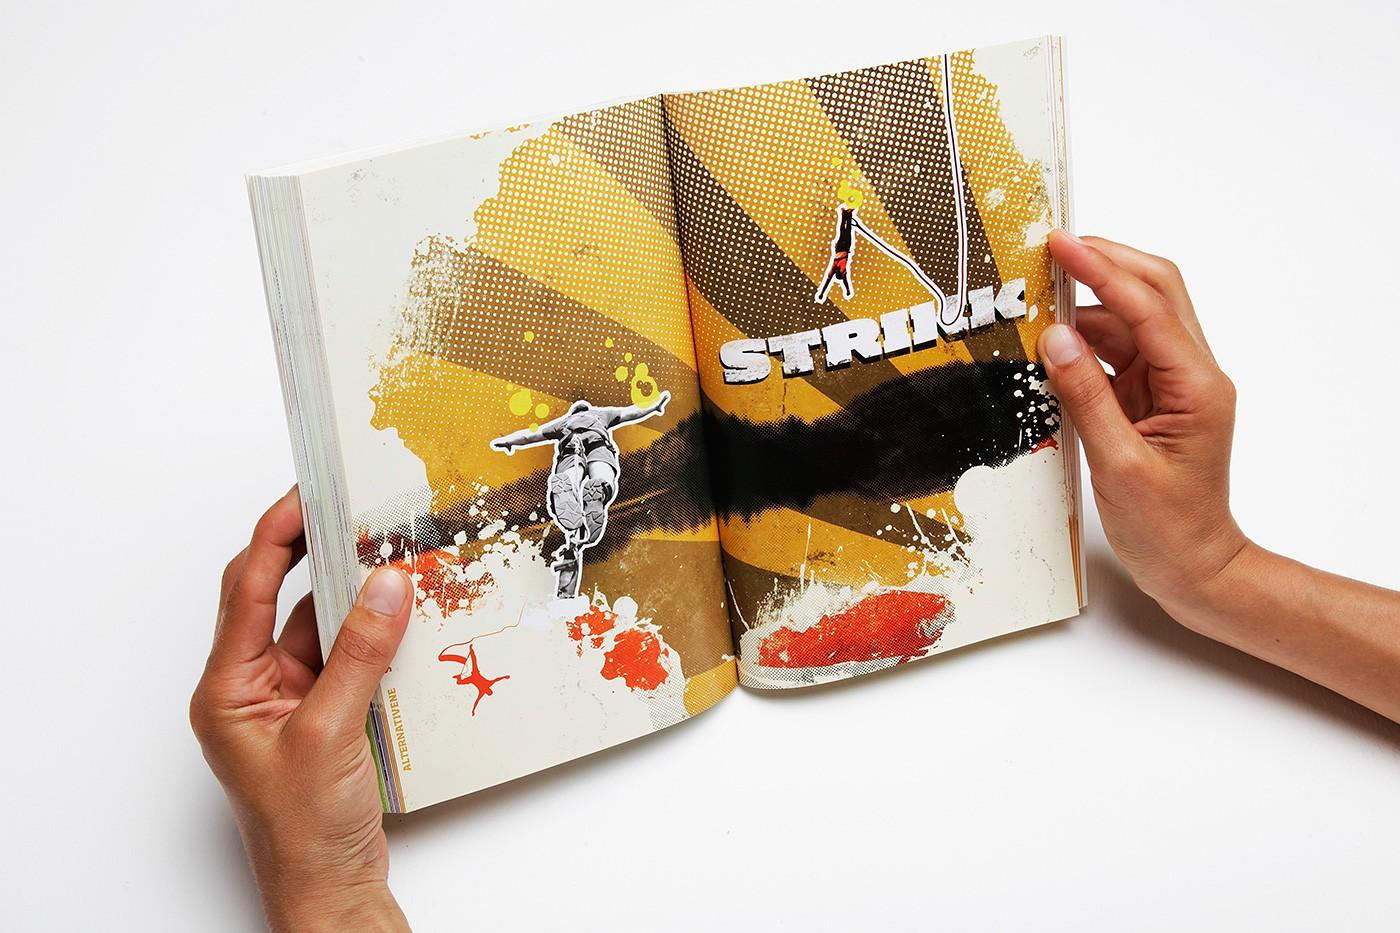 KICK Adrenalinguiden book design by upstruct